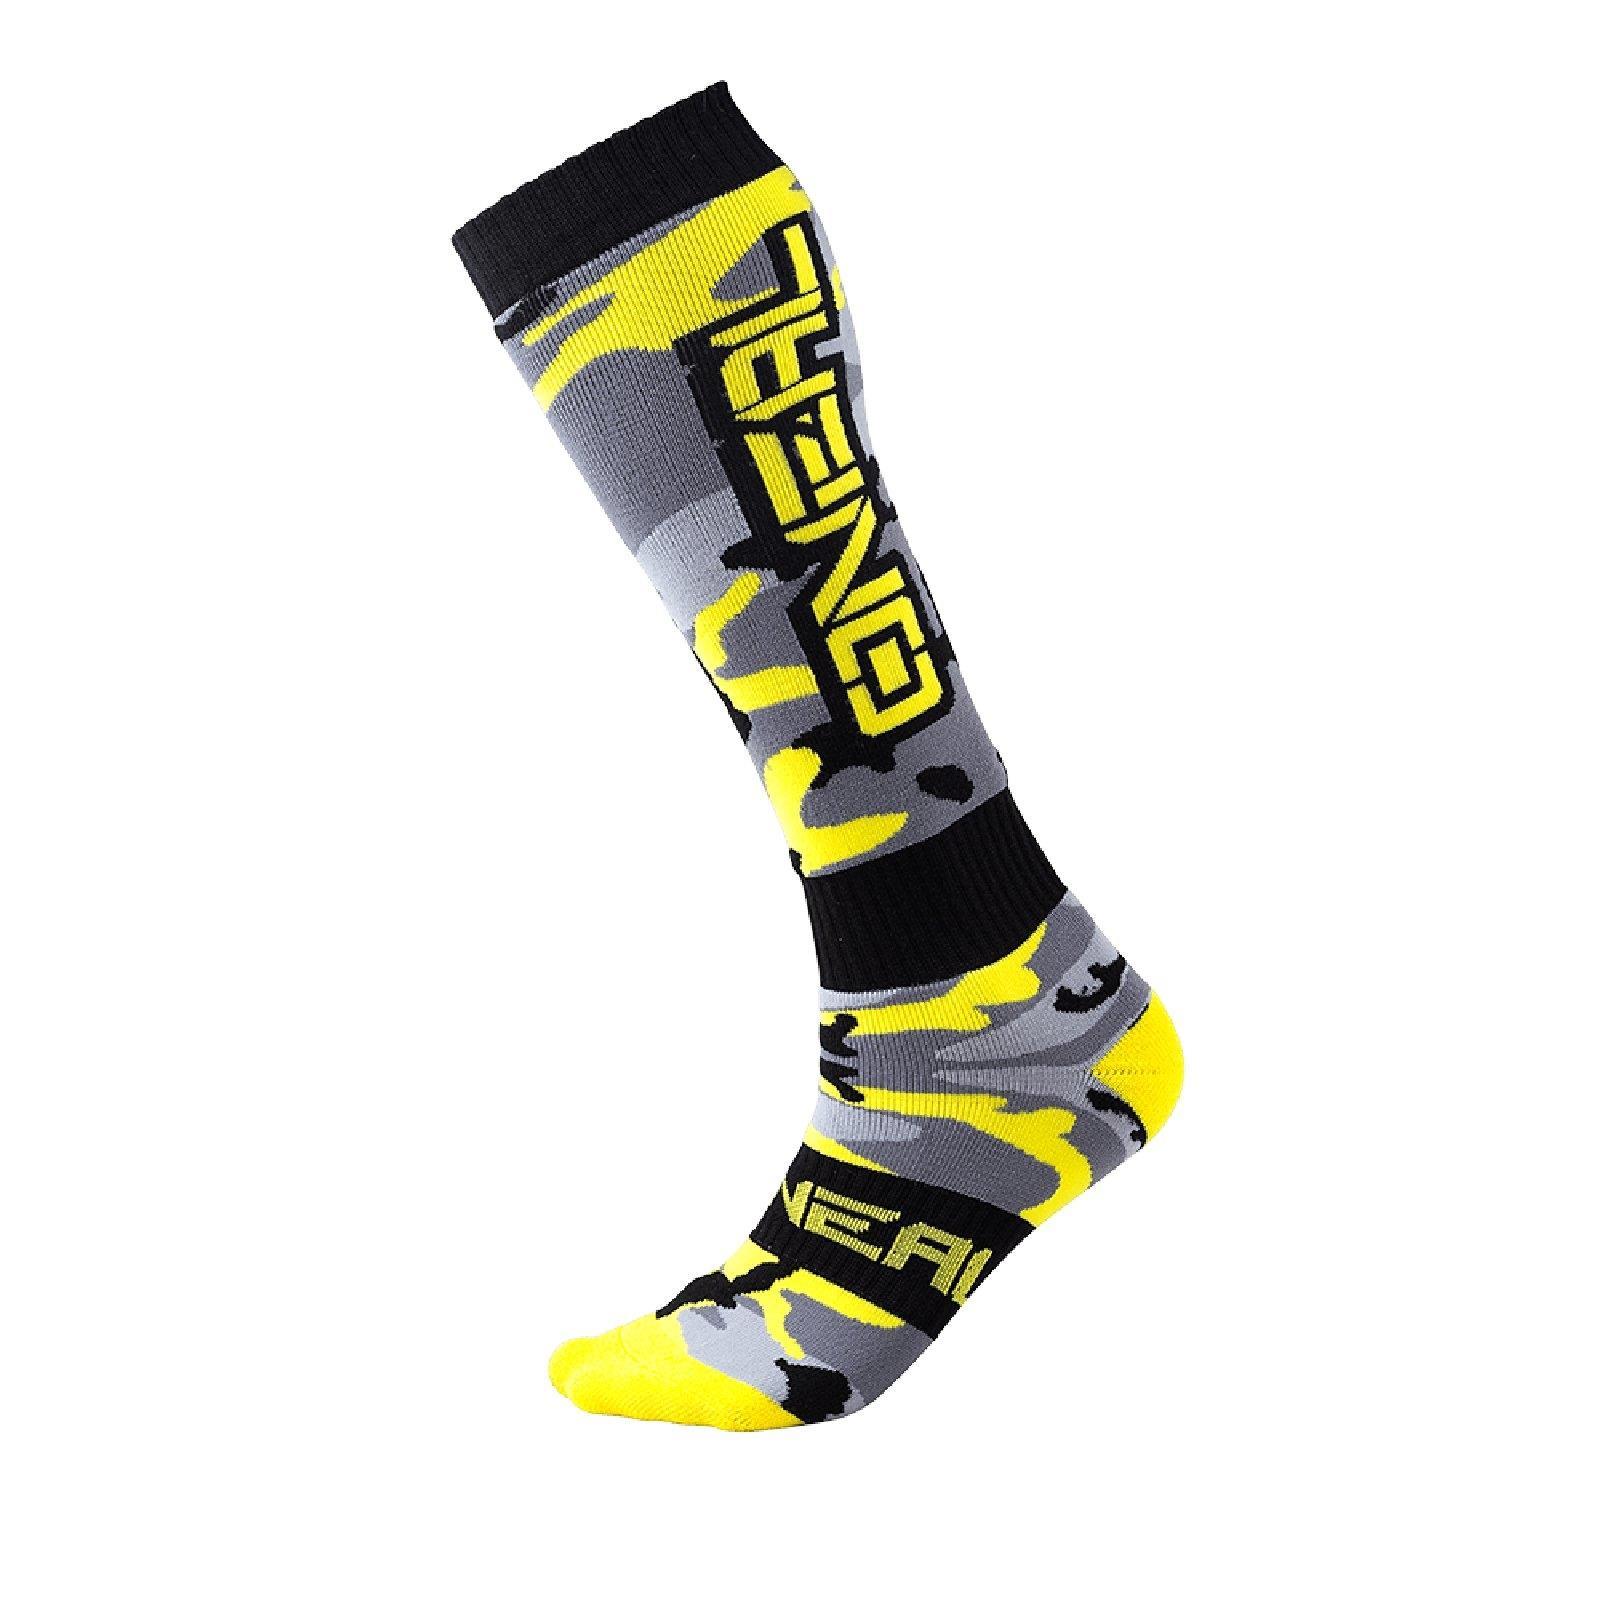 ONEAL-MOTO-CROSS-Calze-Moto-Enduro-MX-MTB-ATV-Quad-Calze-Sock-BICICLETTA-FR miniatura 36